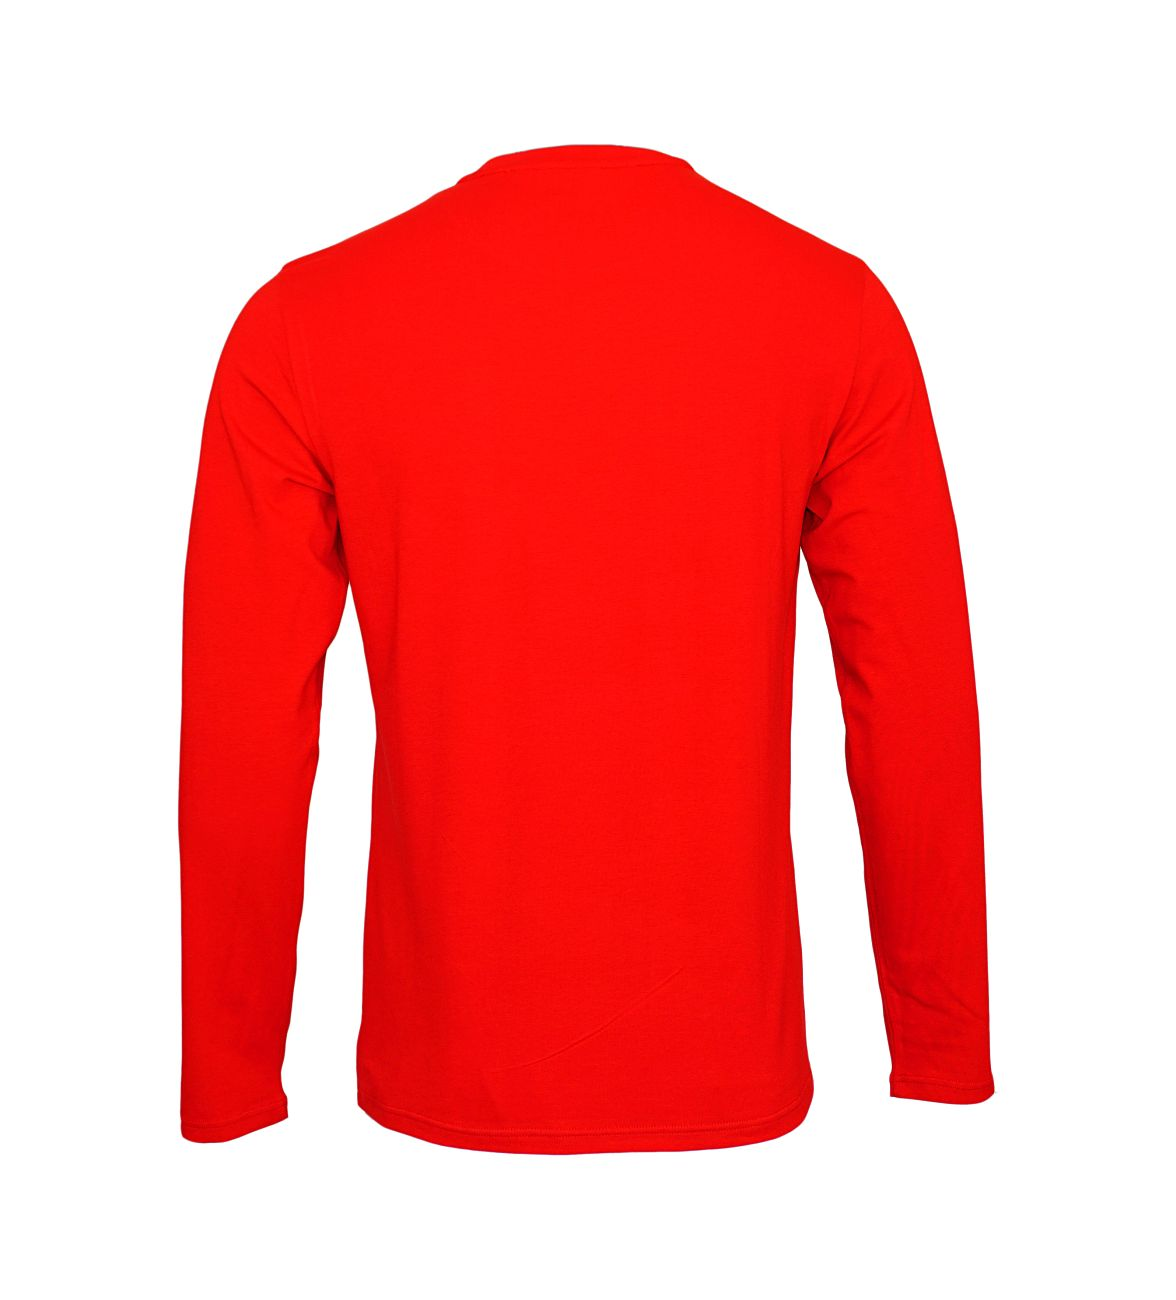 Emporio Armani Longsleeve Rundhals Shirt 111653 8A516 13174 RUBINO WX18-EAL